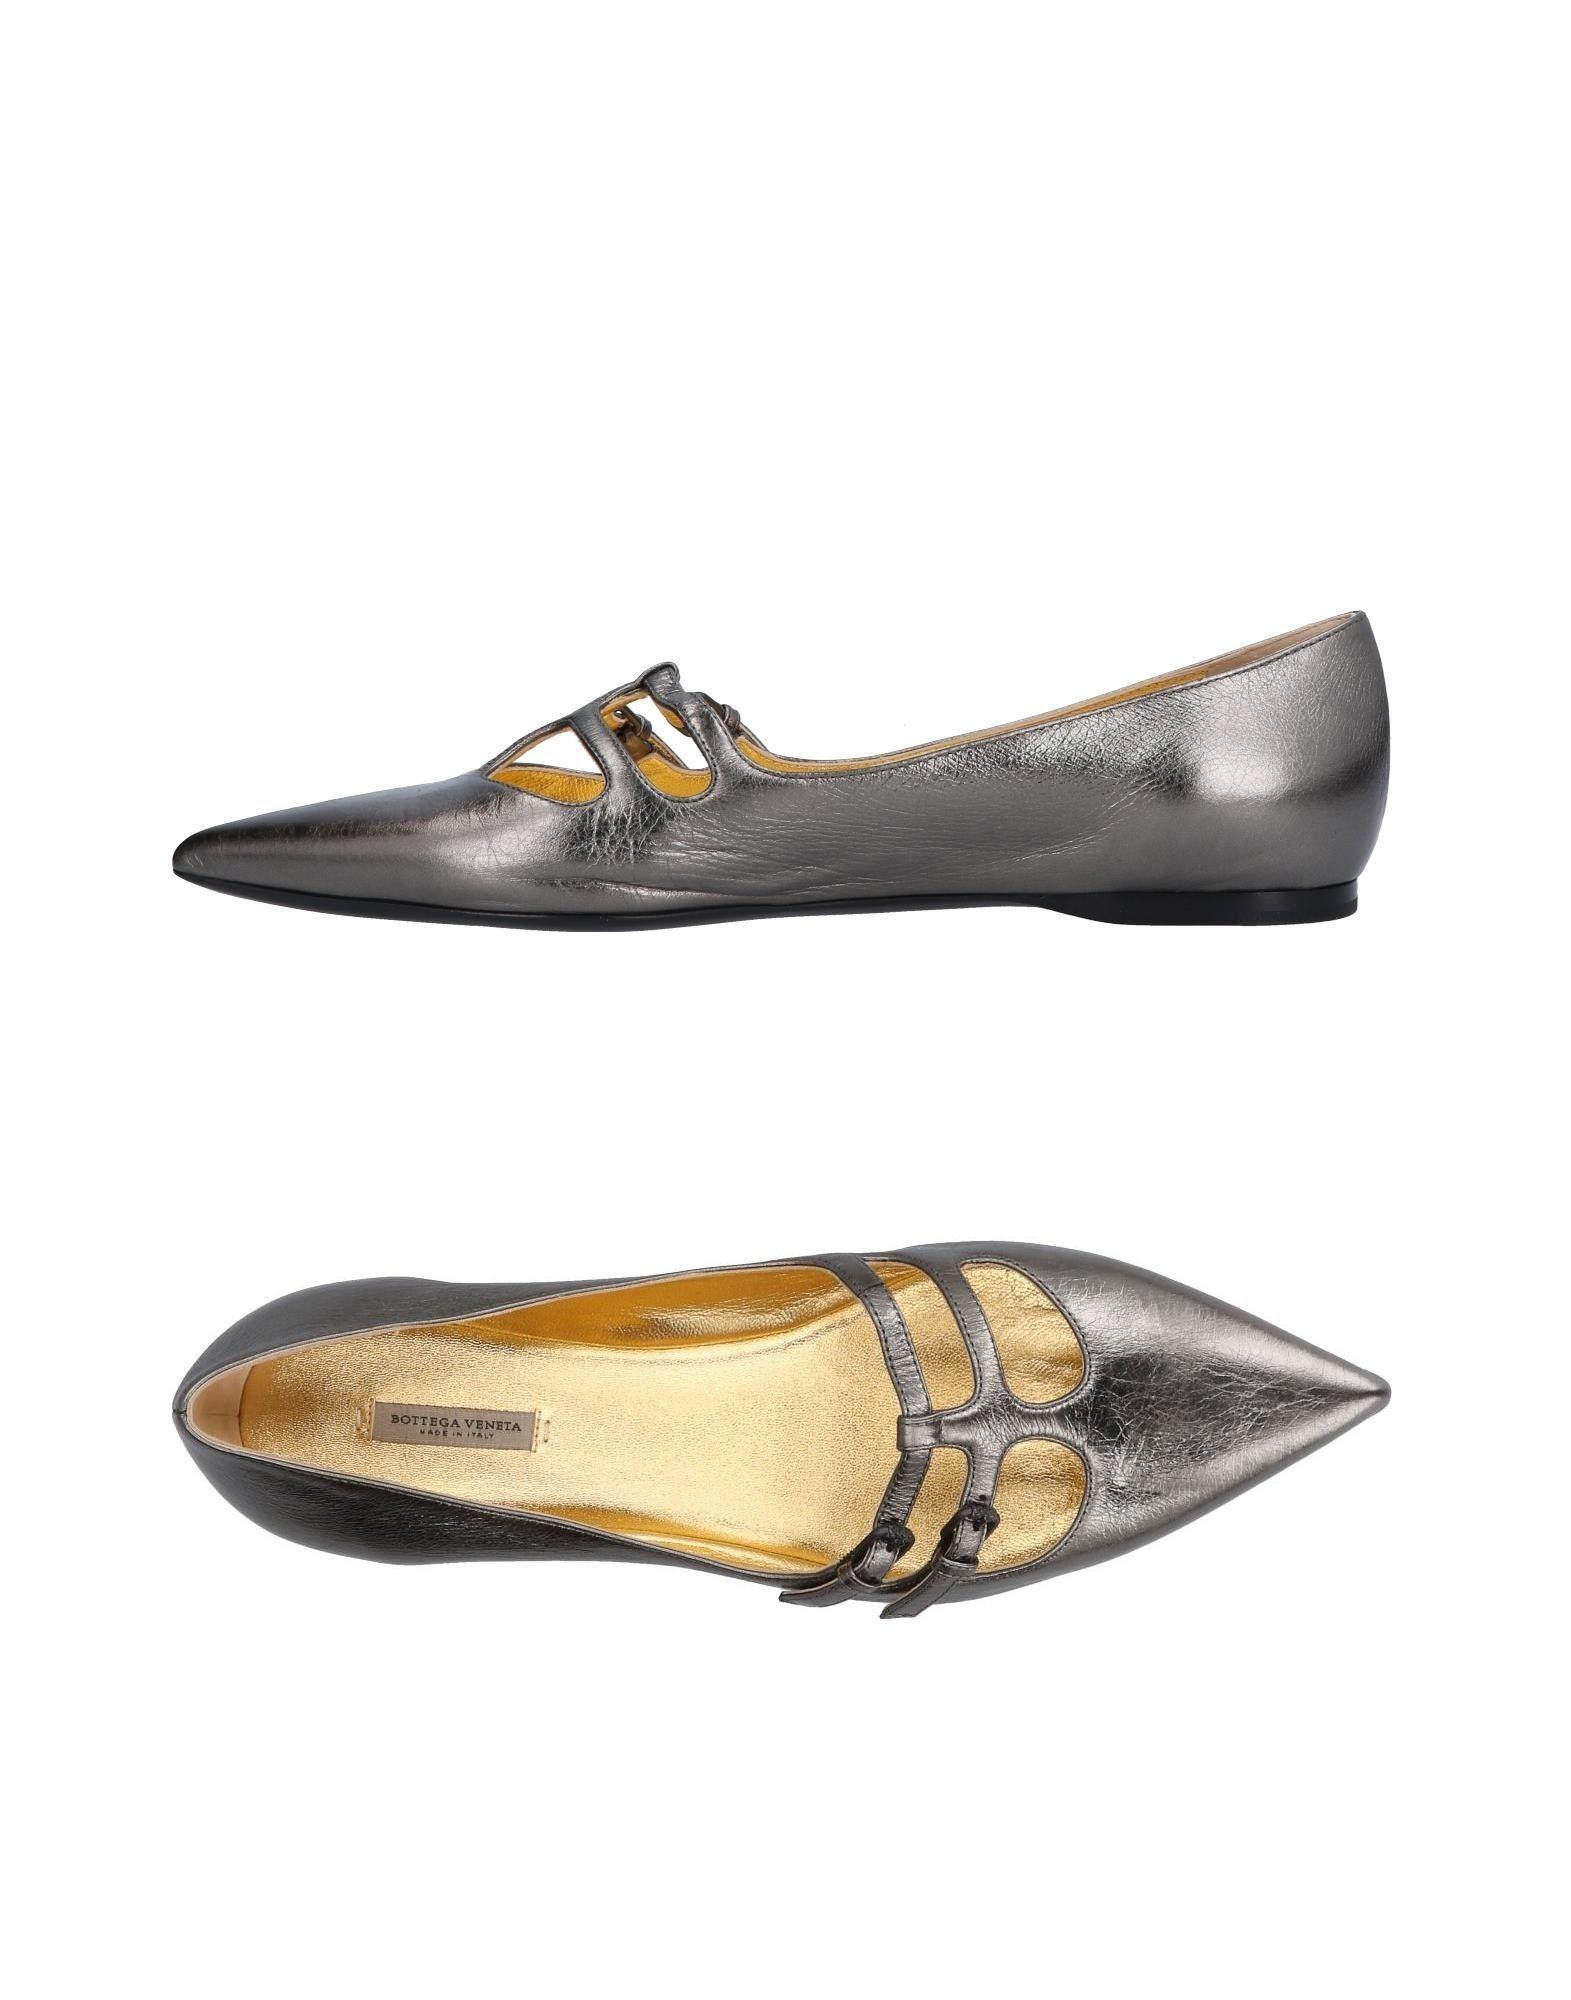 Bottega Ballet Flats Flats - Women Bottega Ballet Flats Flats online on  Australia - 11476549RF c04af0